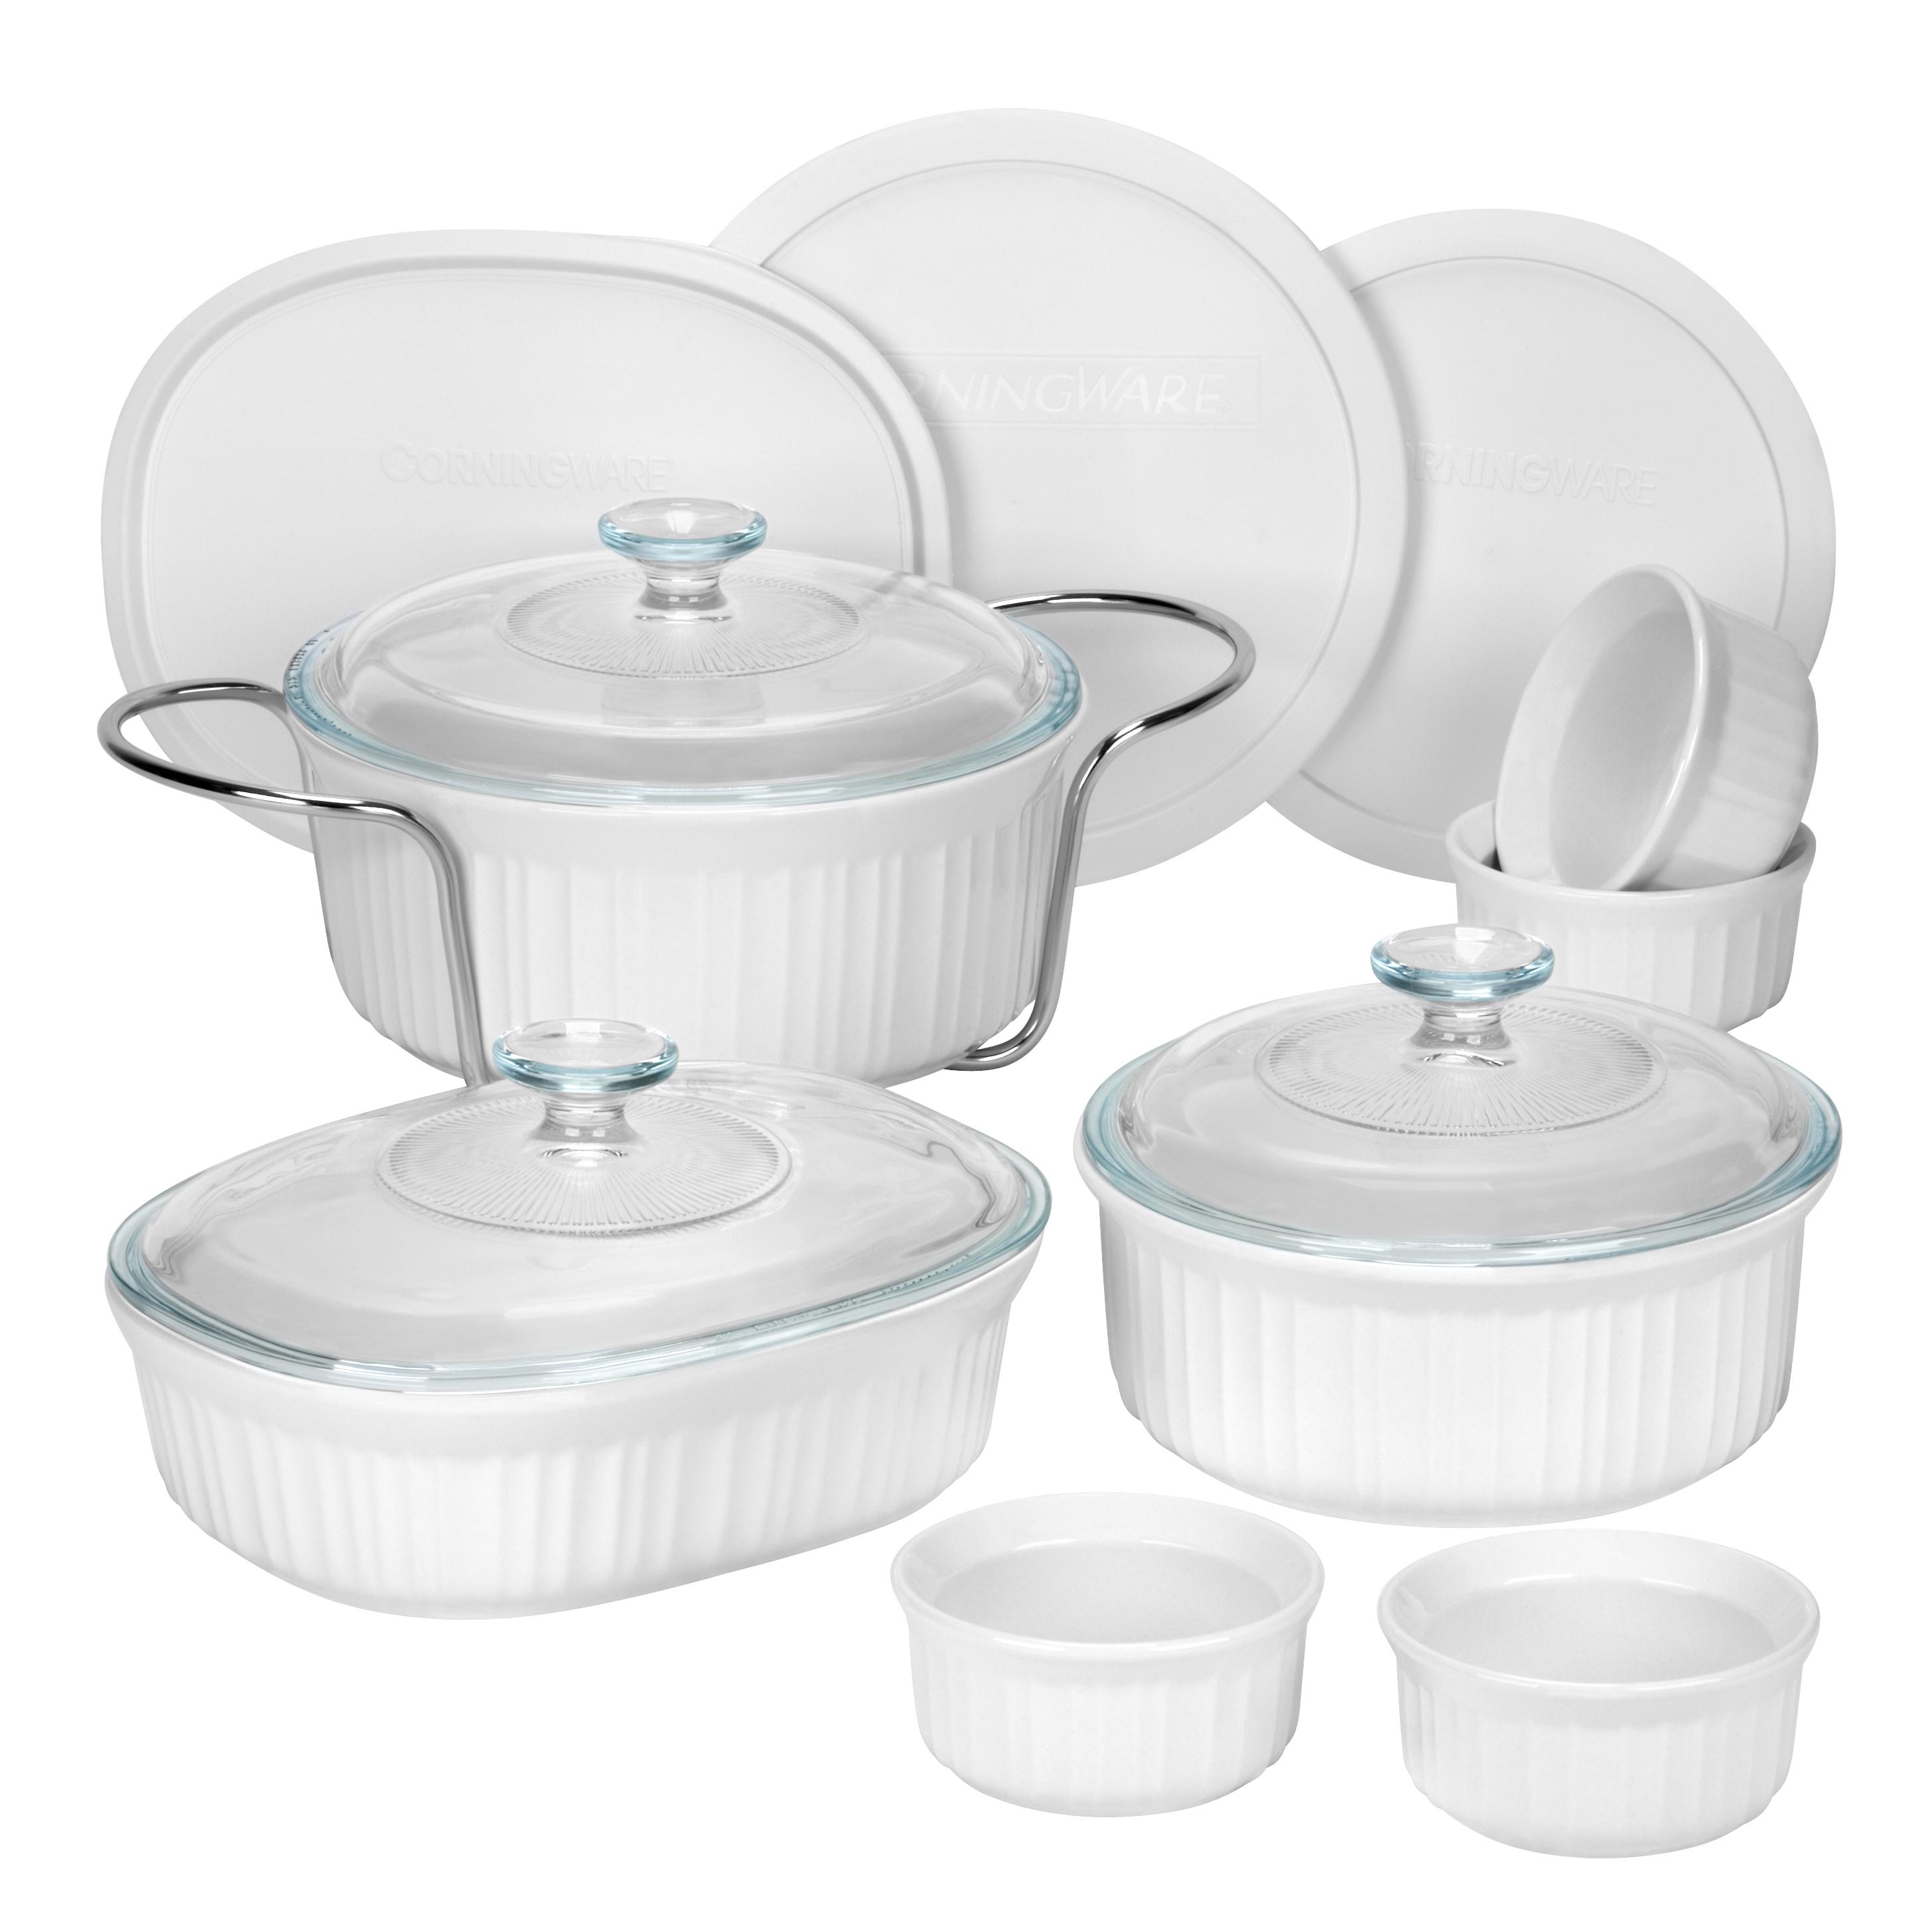 Corningware 14Piece White Bakeware Set